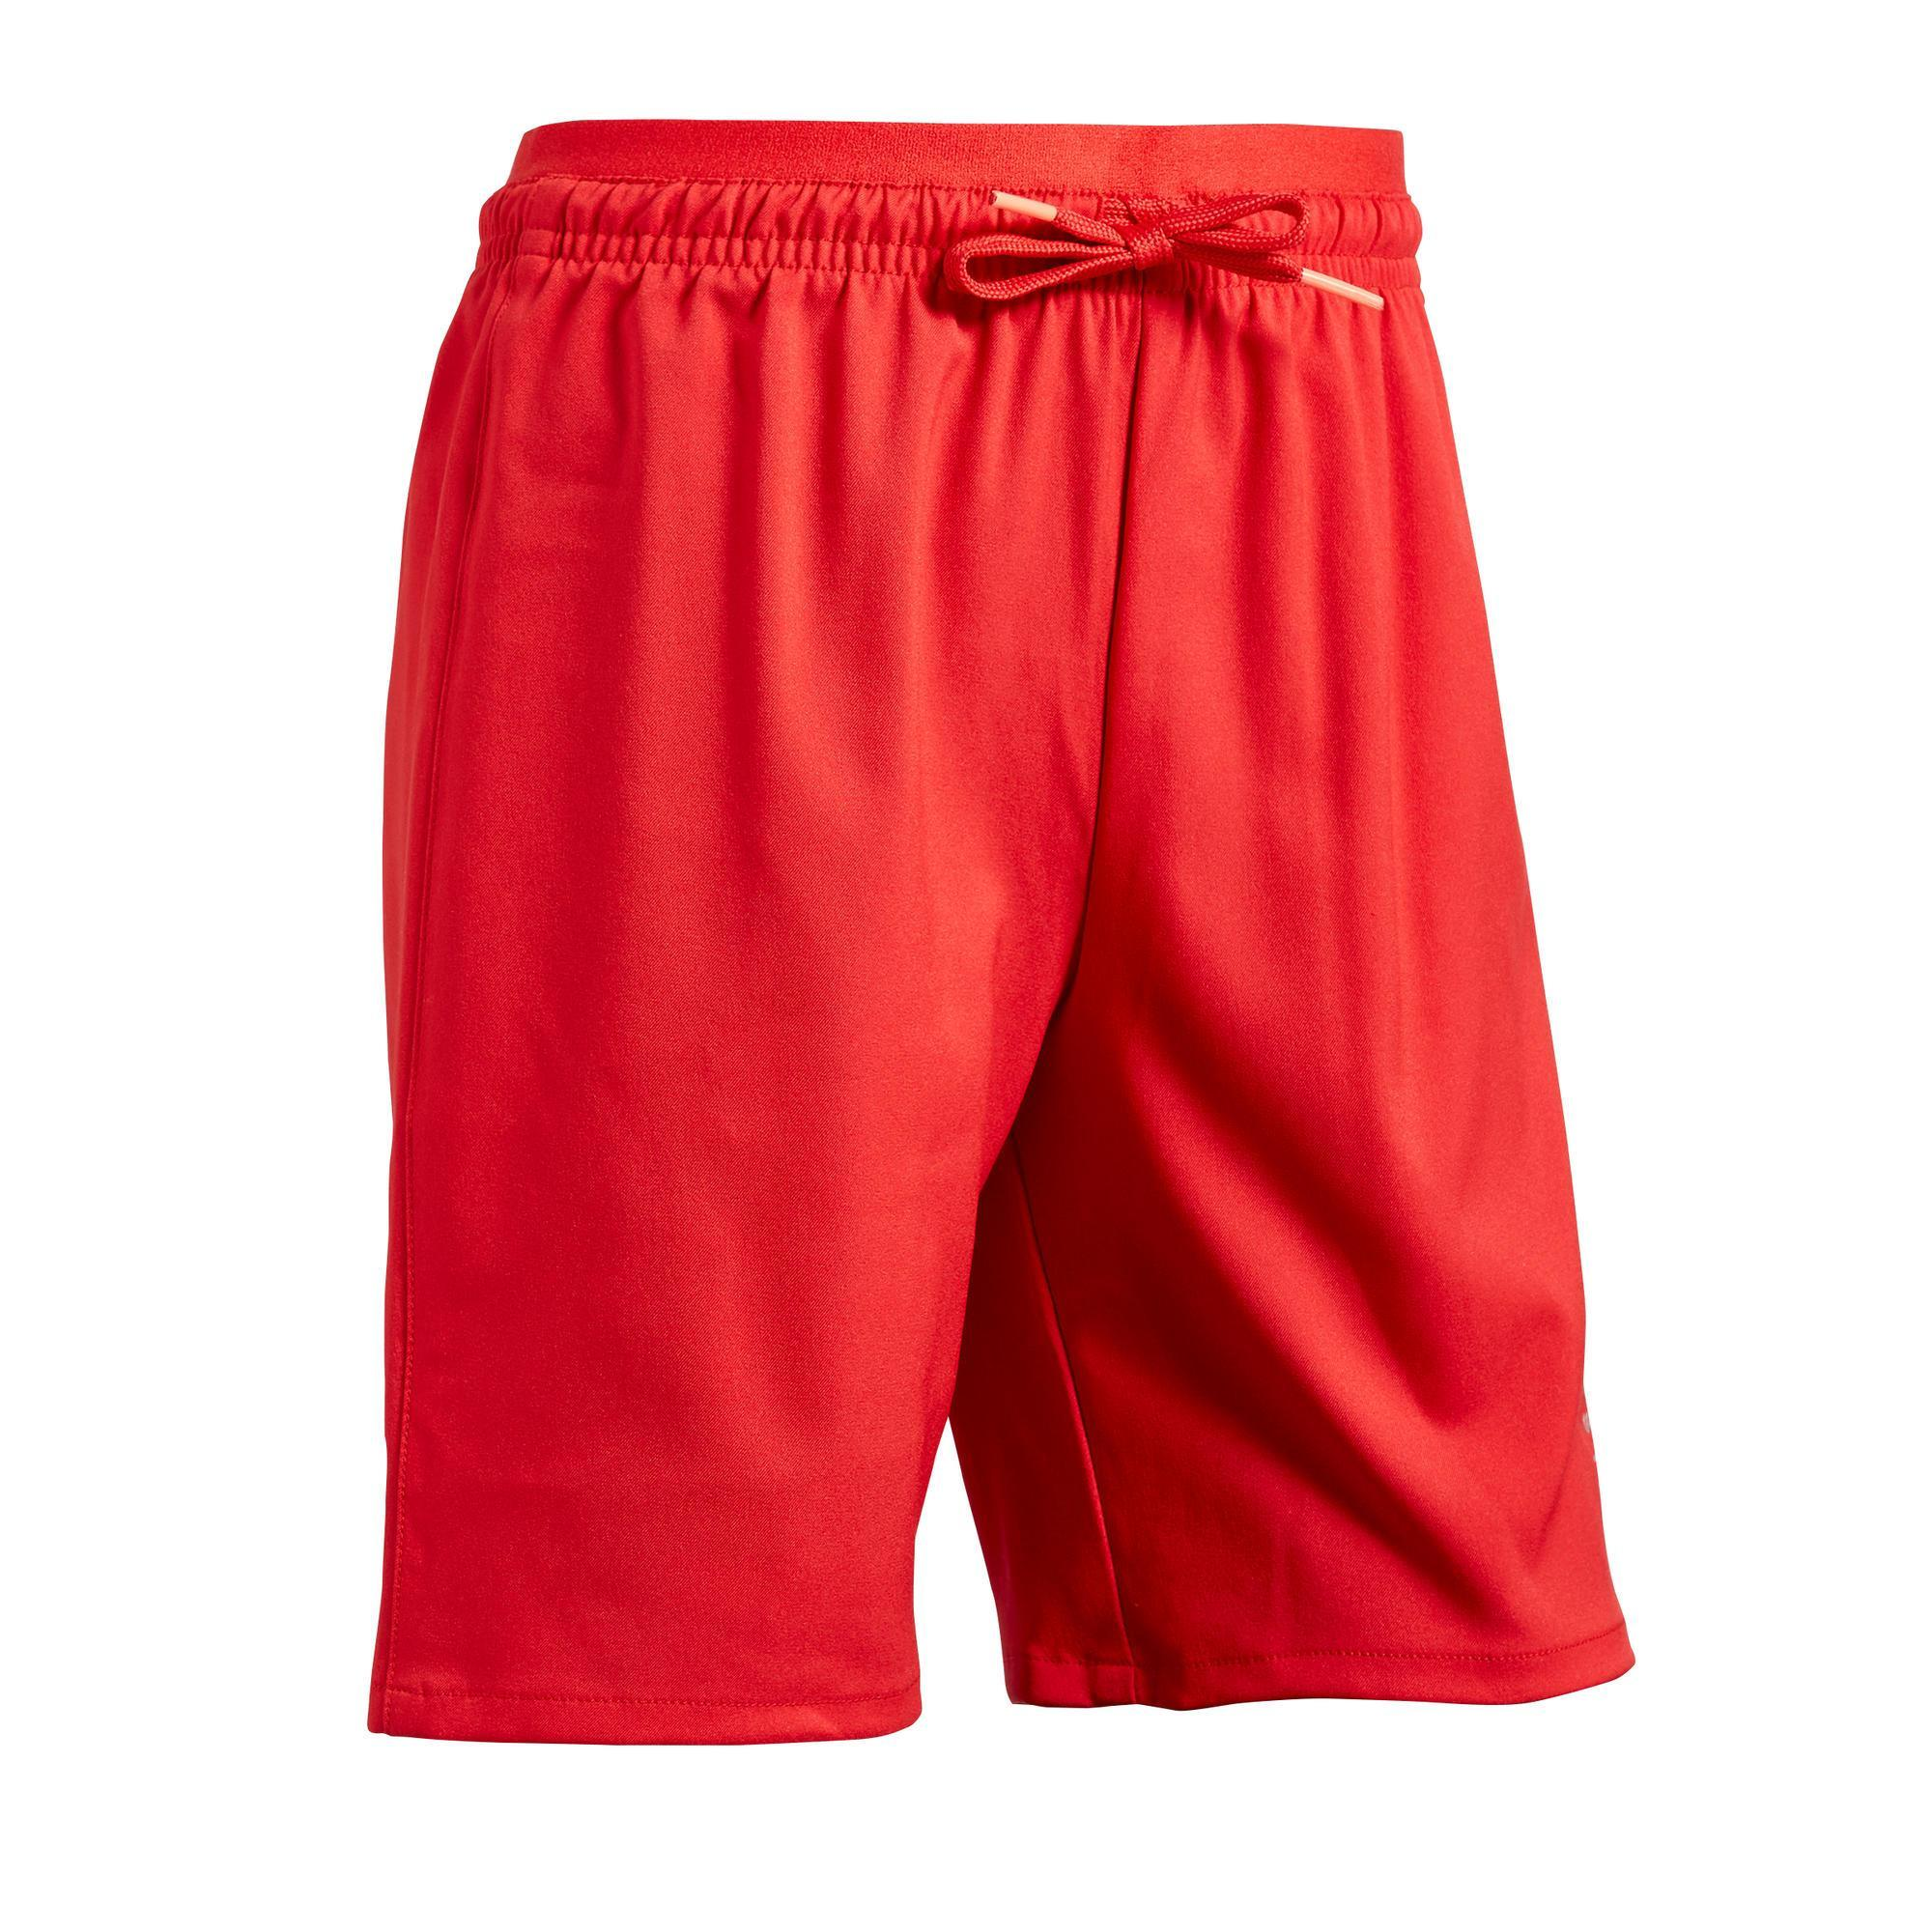 authentic quality low price innovative design Shorts de football   FOOTBALL   DECATHLON